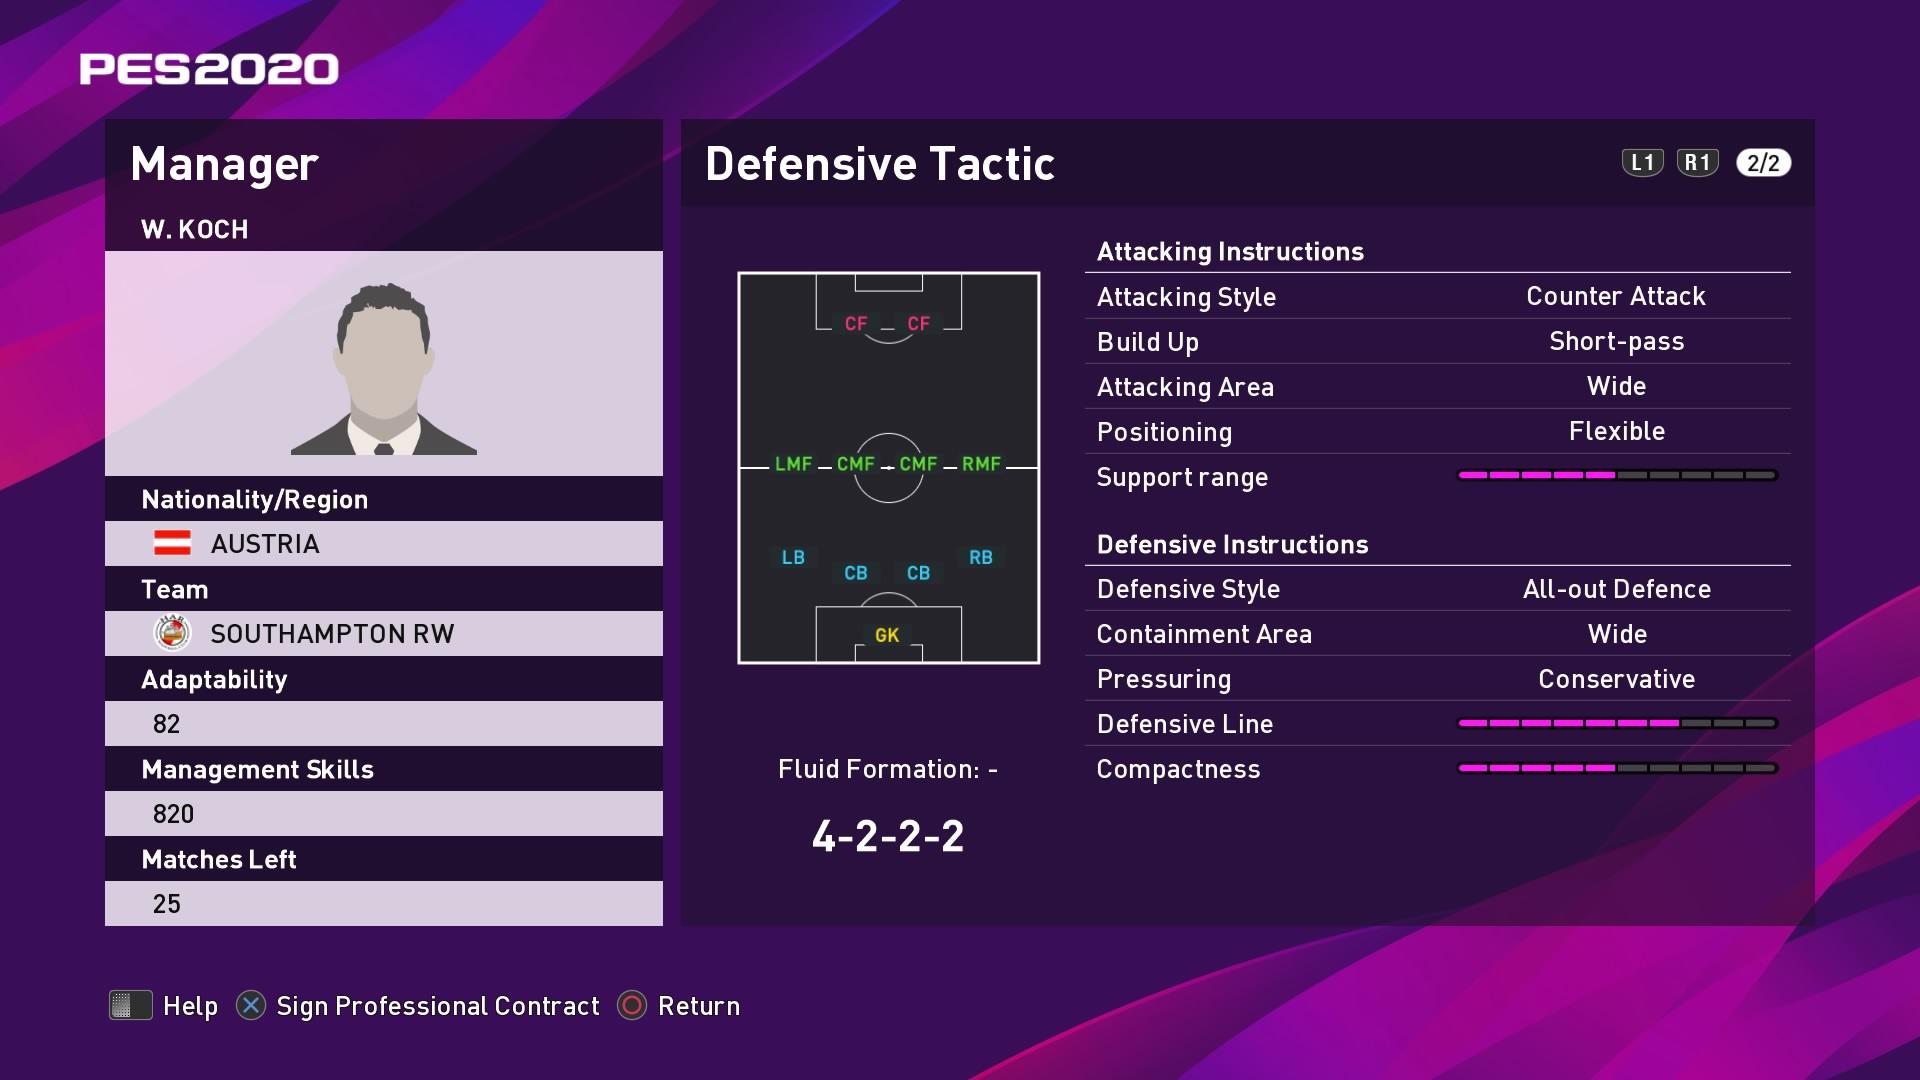 W. Koch (Ralph Hasenhüttl) Defensive Tactic in PES 2020 myClub